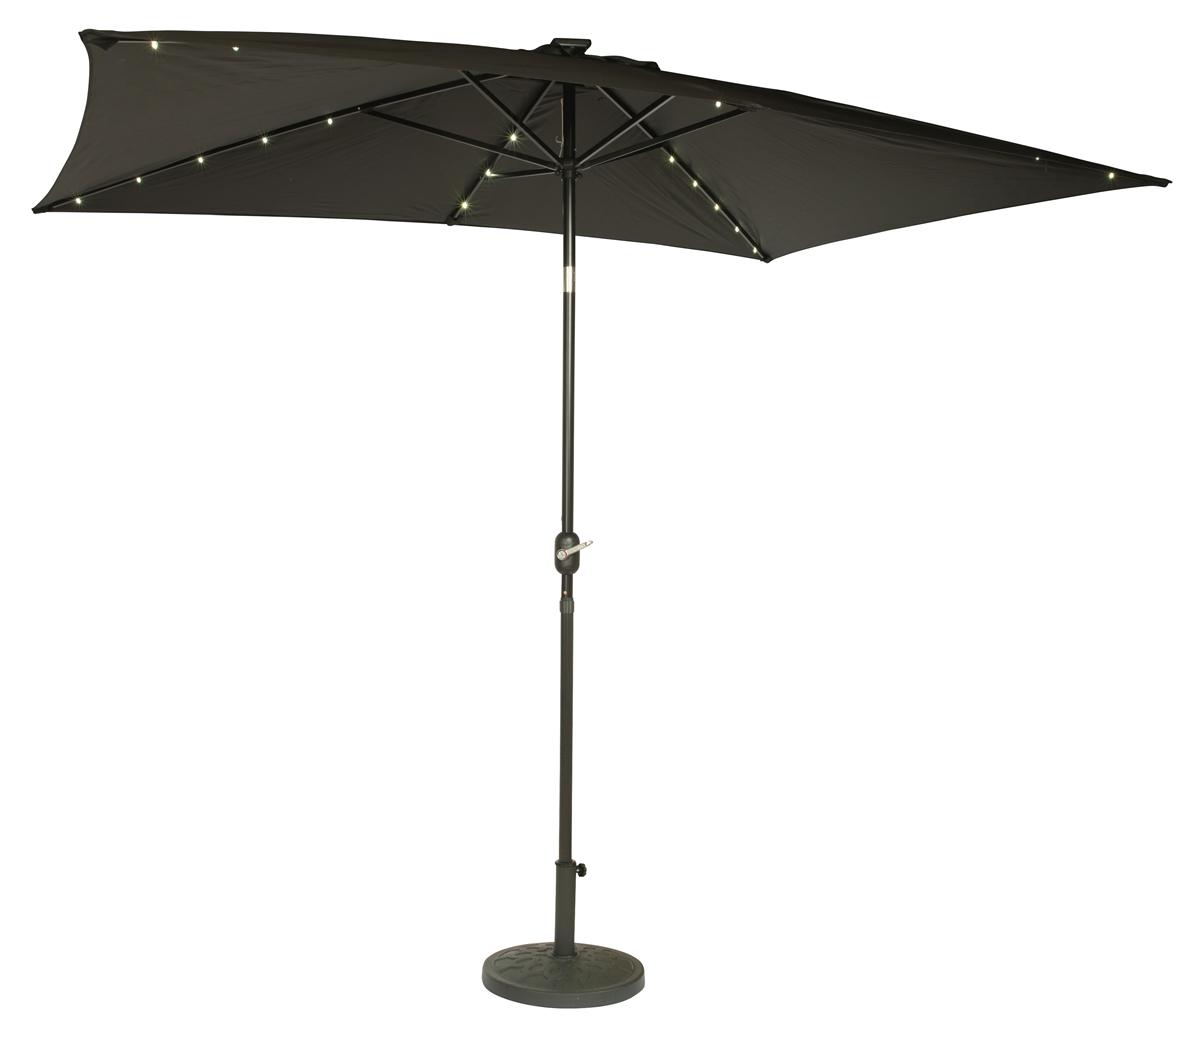 10 x 6 5 rectangular solar powered led lighted patio umbrella by trademark innovations black